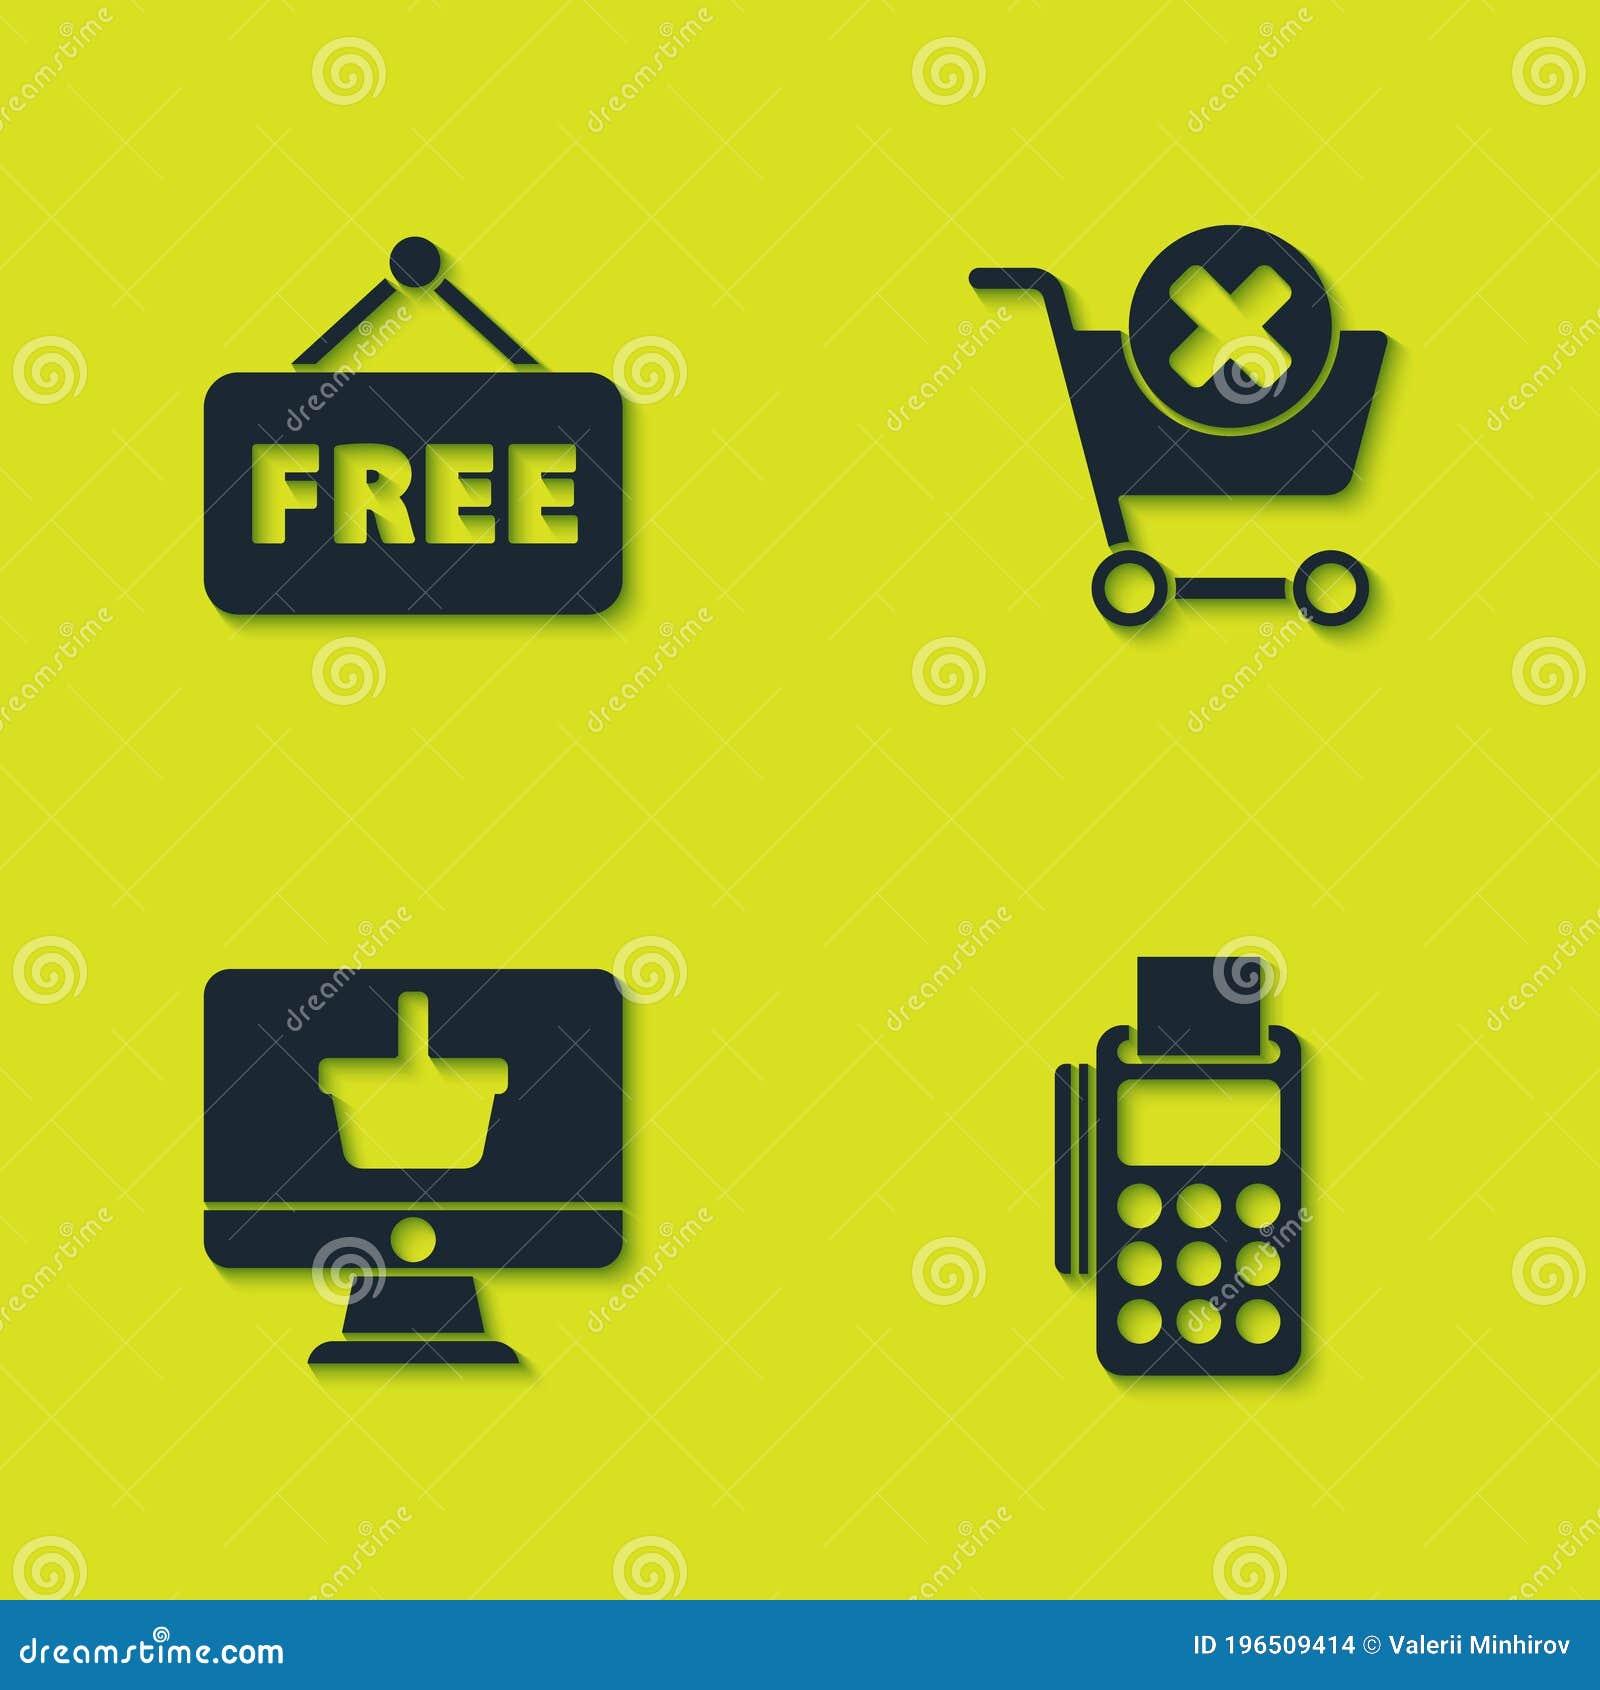 Pos online free 7 Free